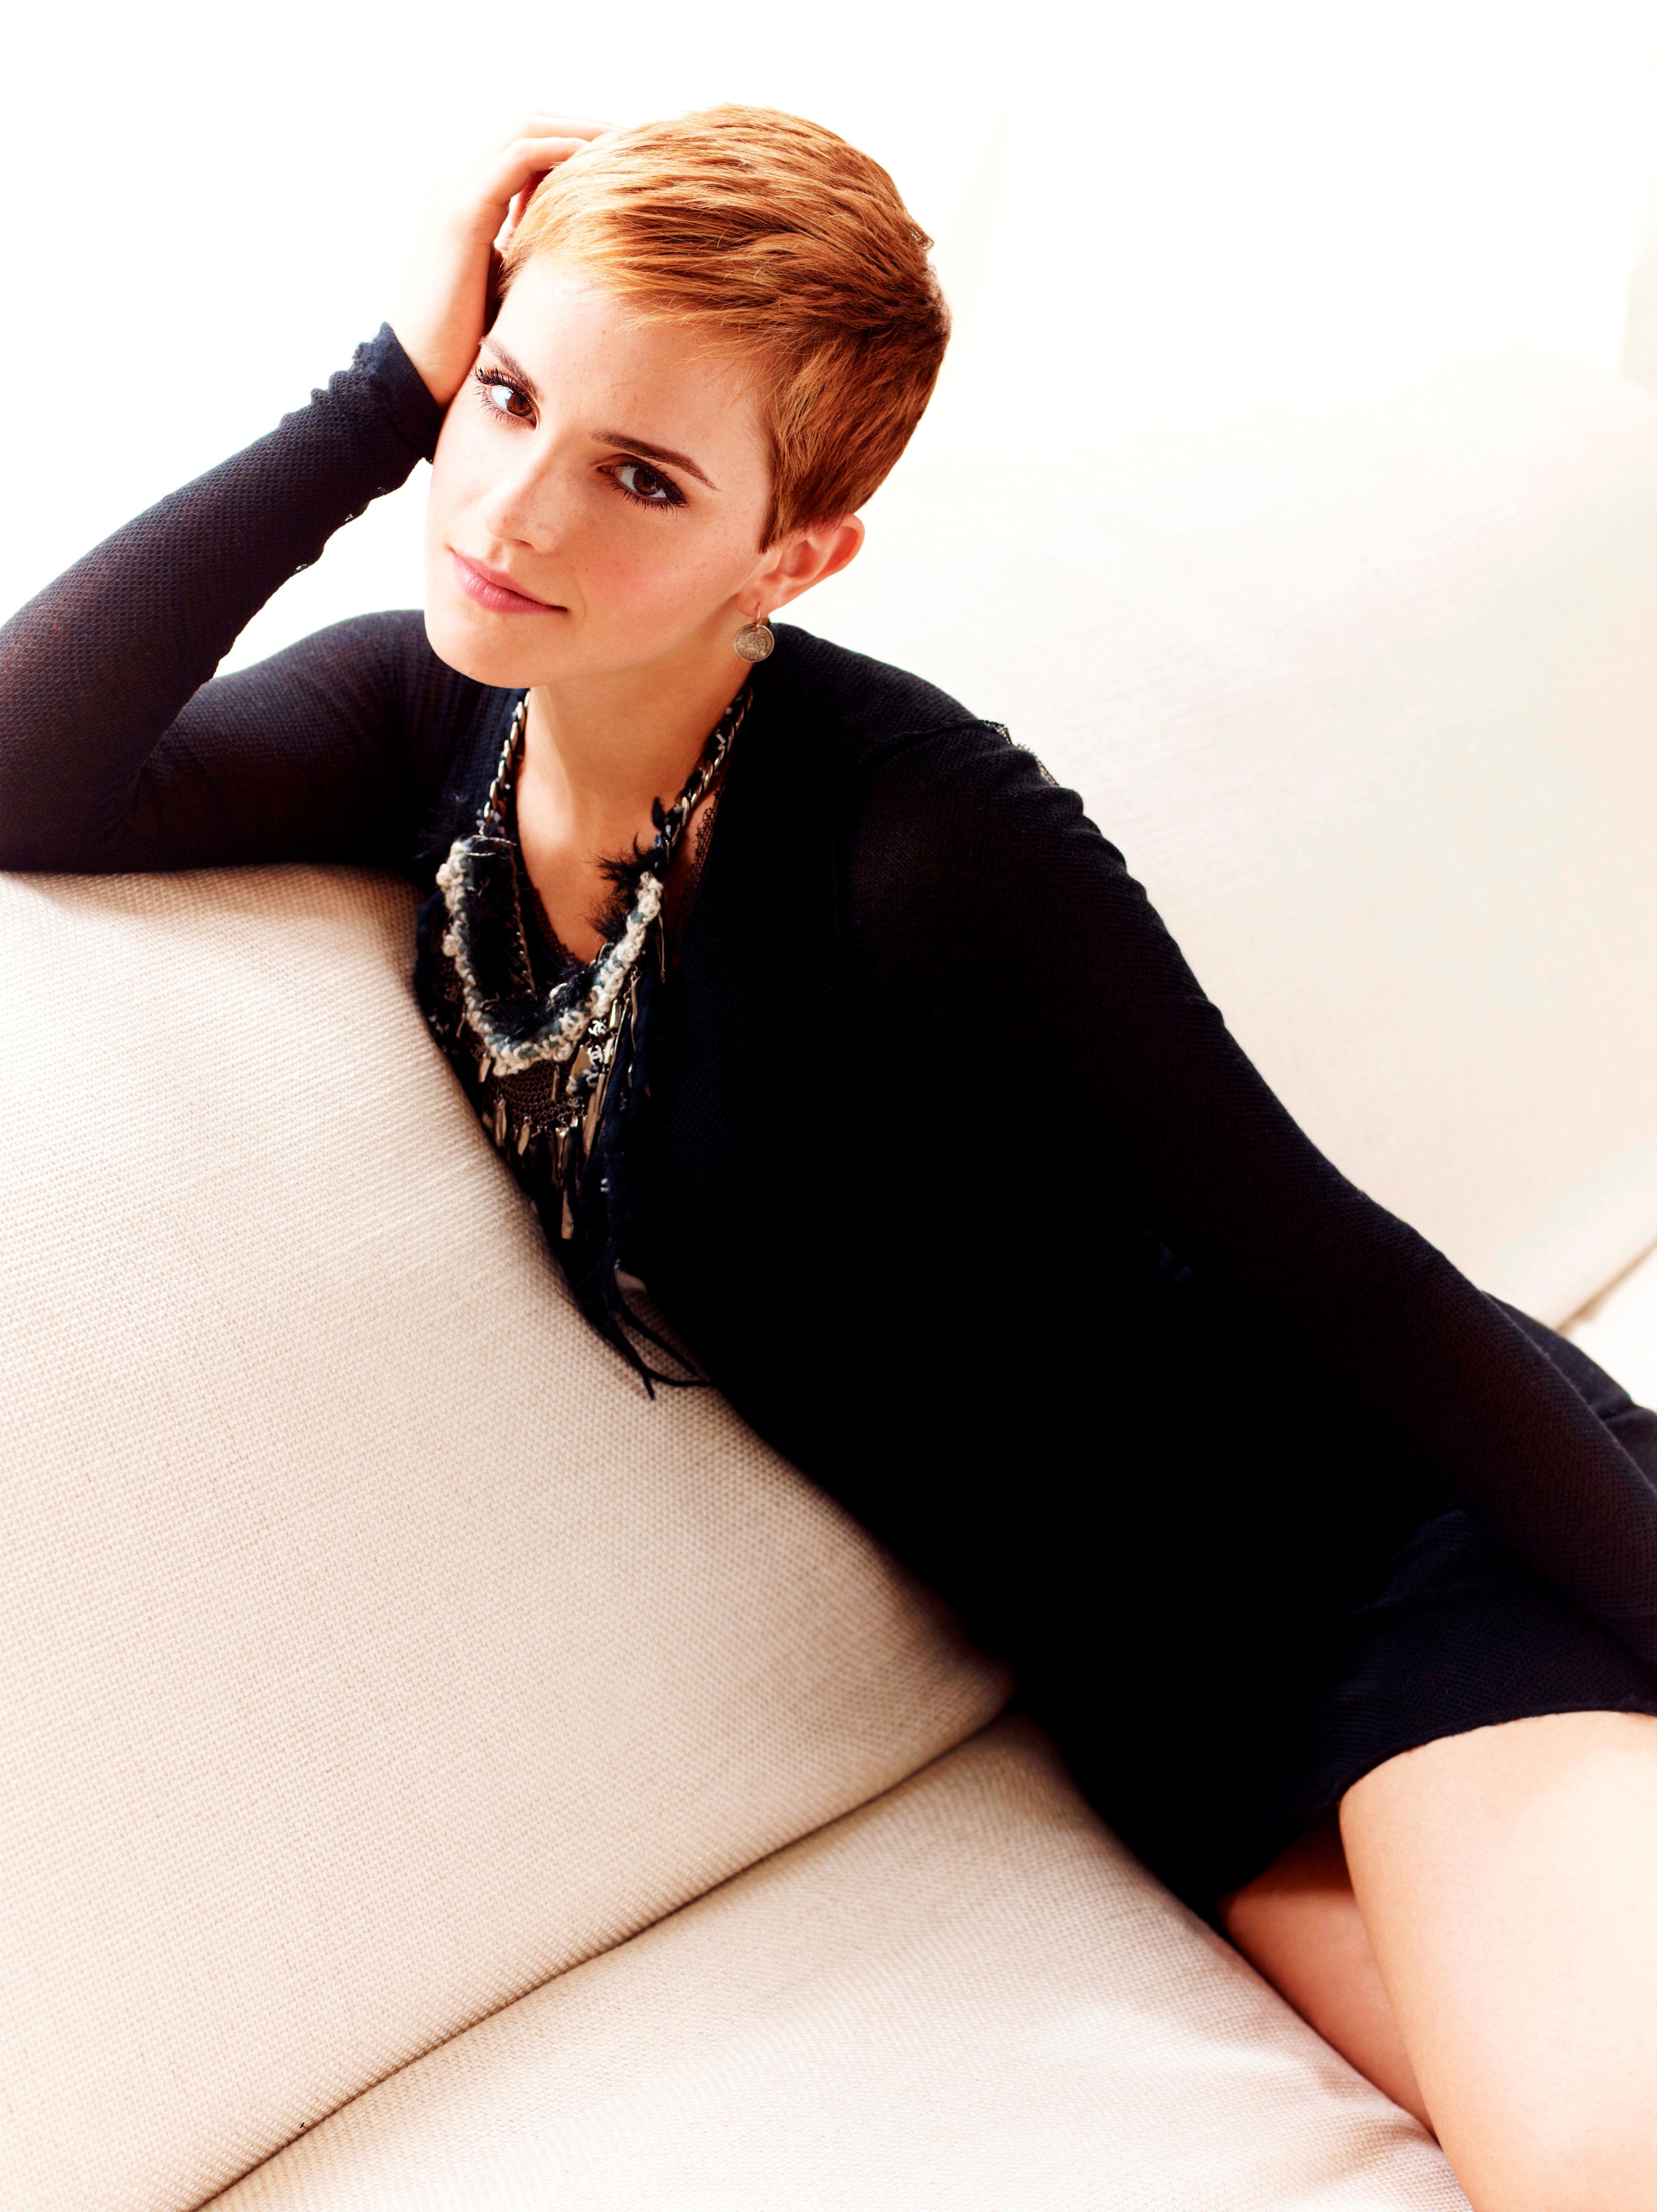 82095_Emma_Watson_Photoshoot_for_Stylist_Magazine10_122_572lo.jpg